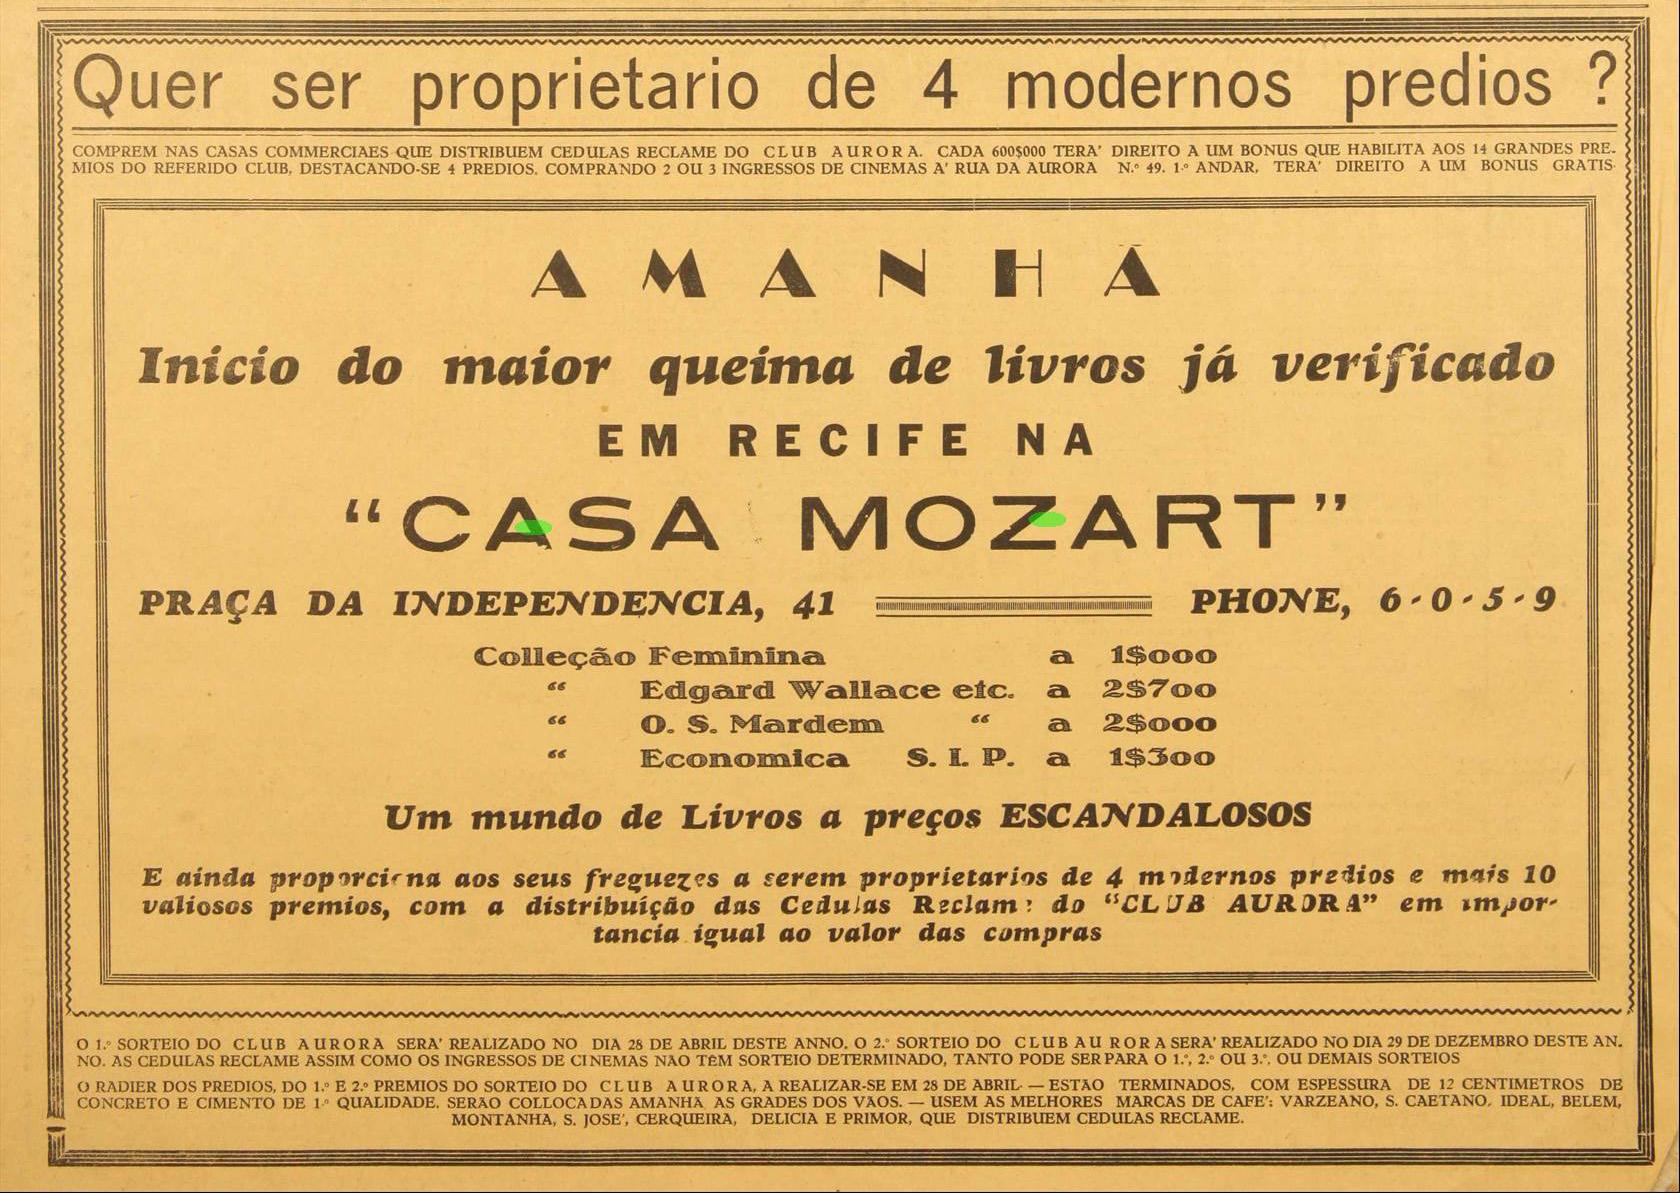 casamozart_diariodamanha1935